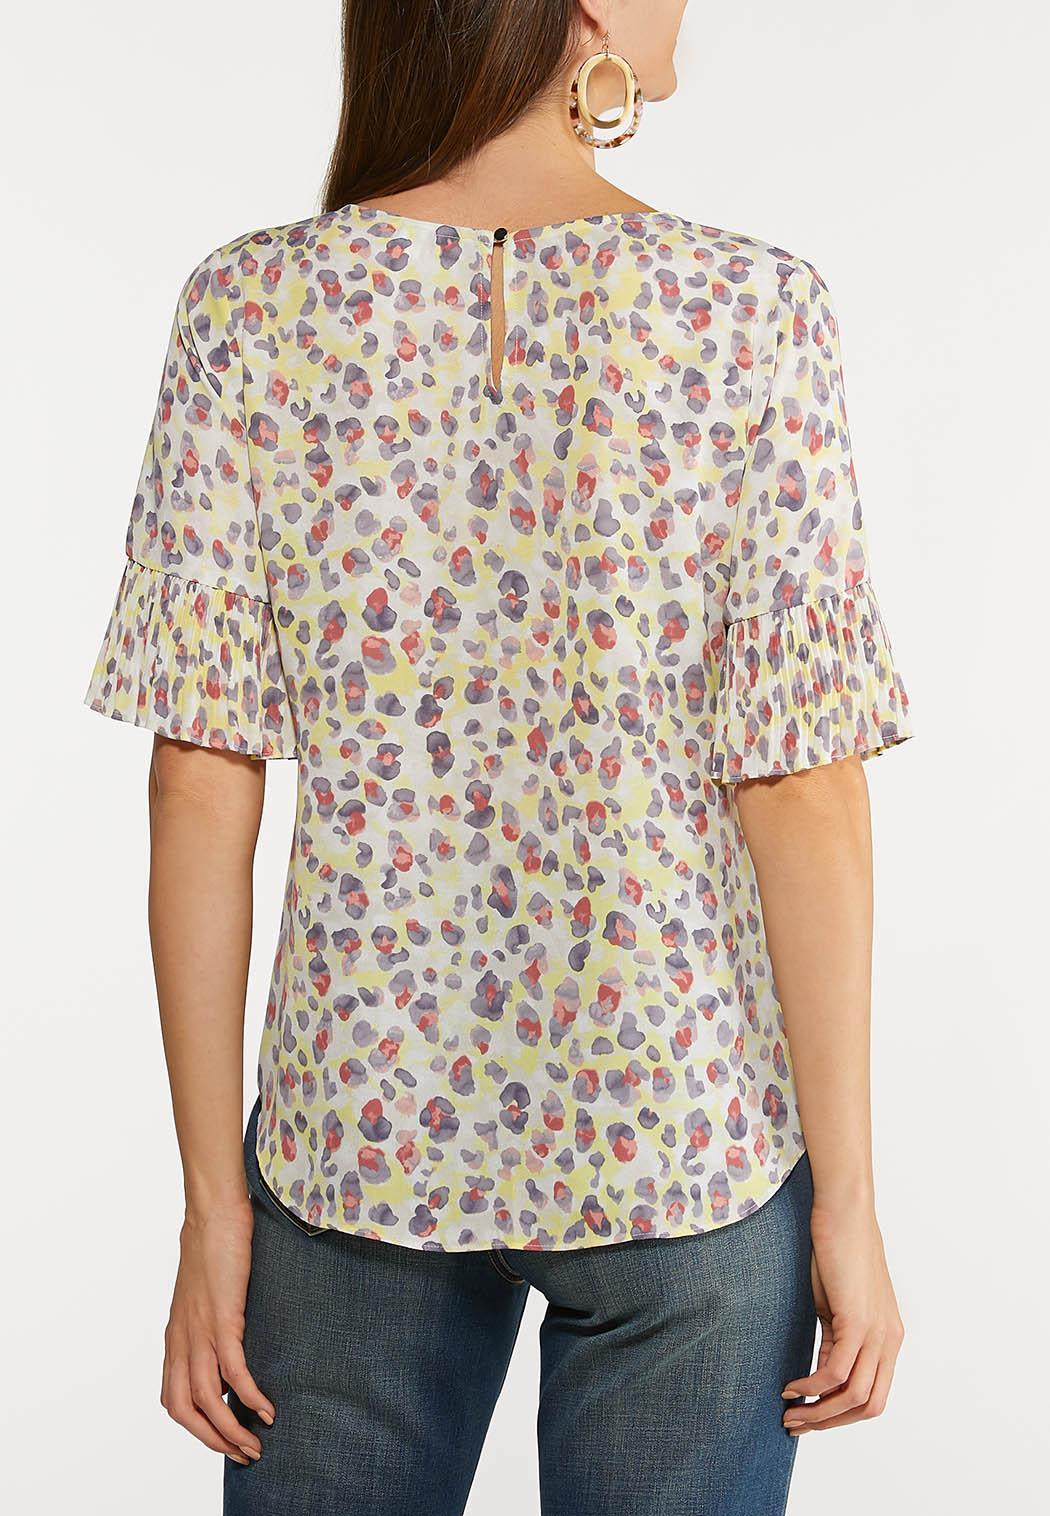 Plus Size Pleated Sleeve Printed Top (Item #44101150)